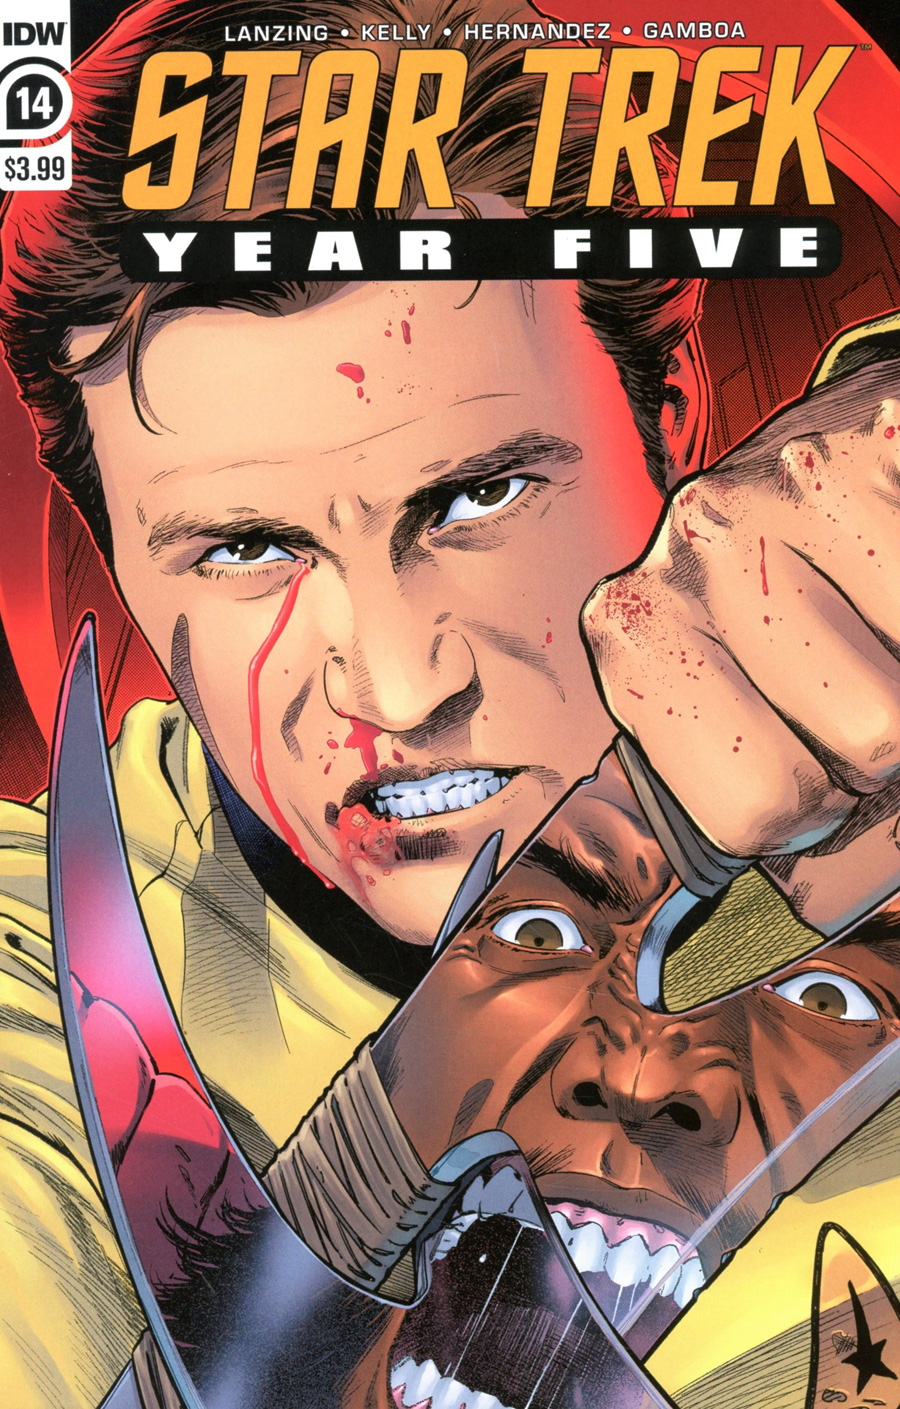 Star Trek Year Five #14 Cover A Regular Stephen Thompson Cover